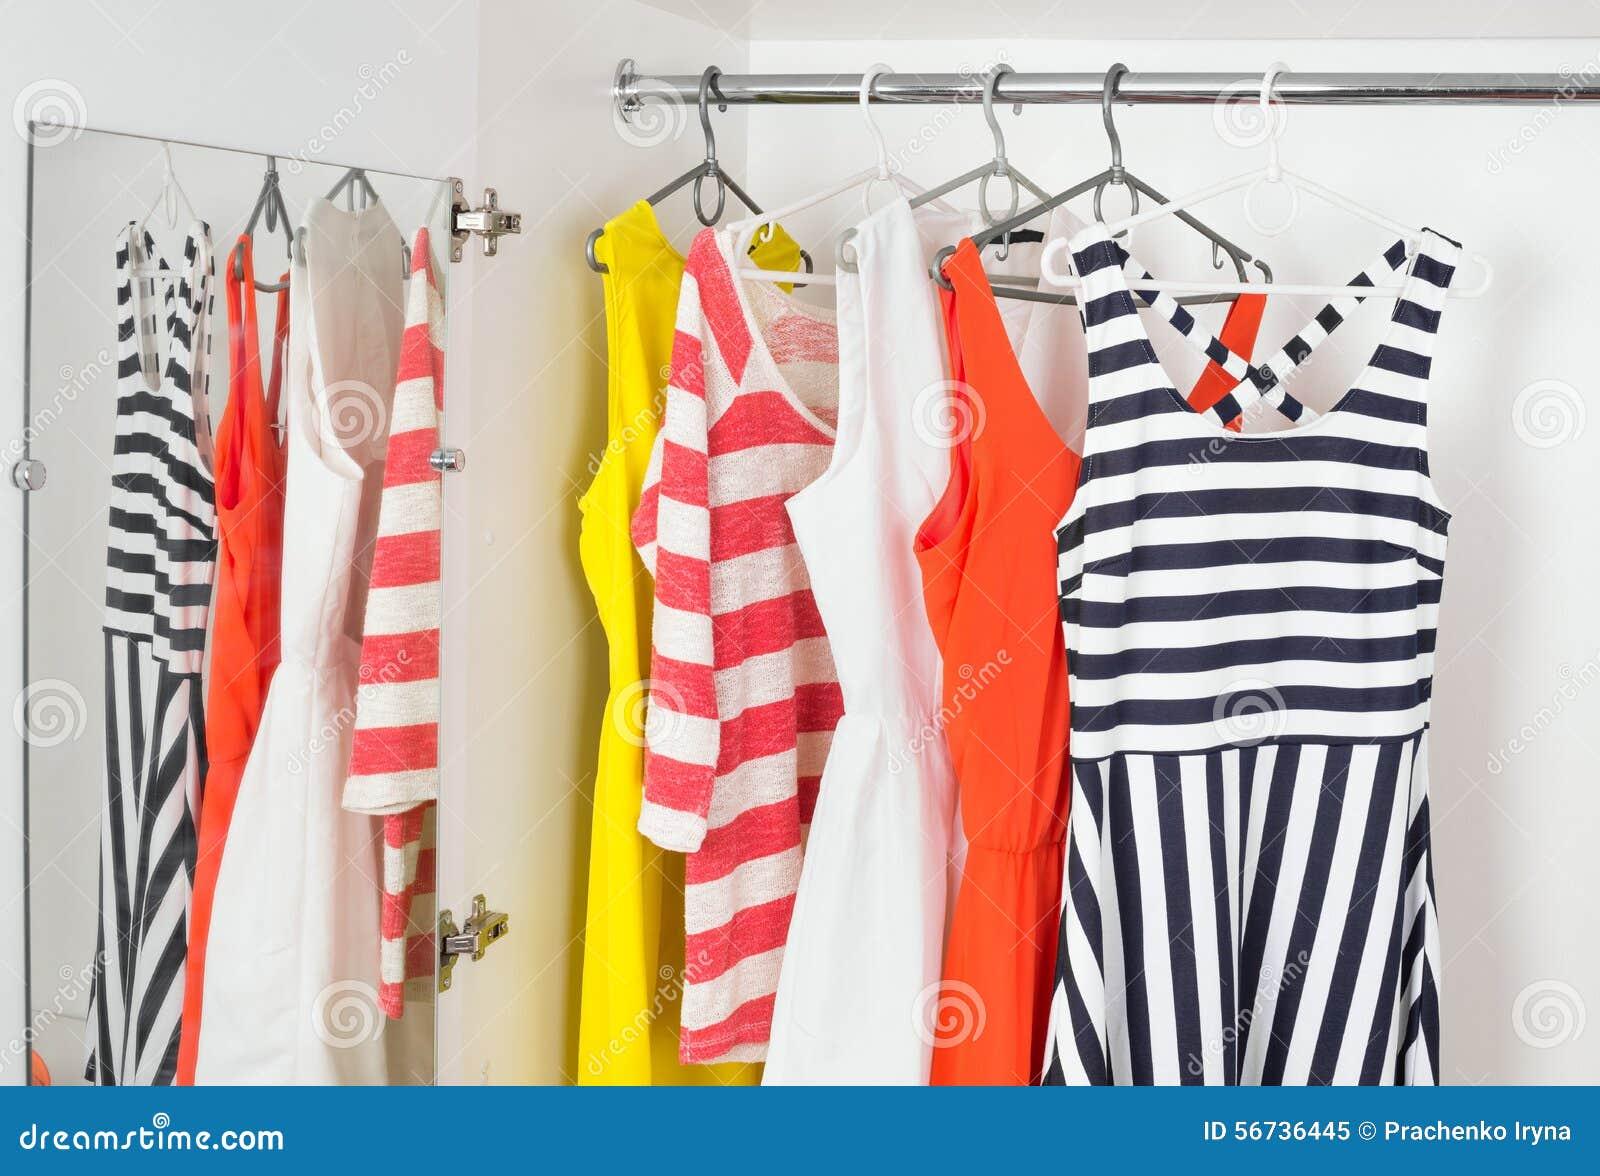 033cdb403fa Fashion Women s Dresses On Hangers Stock Image - Image of fashion ...